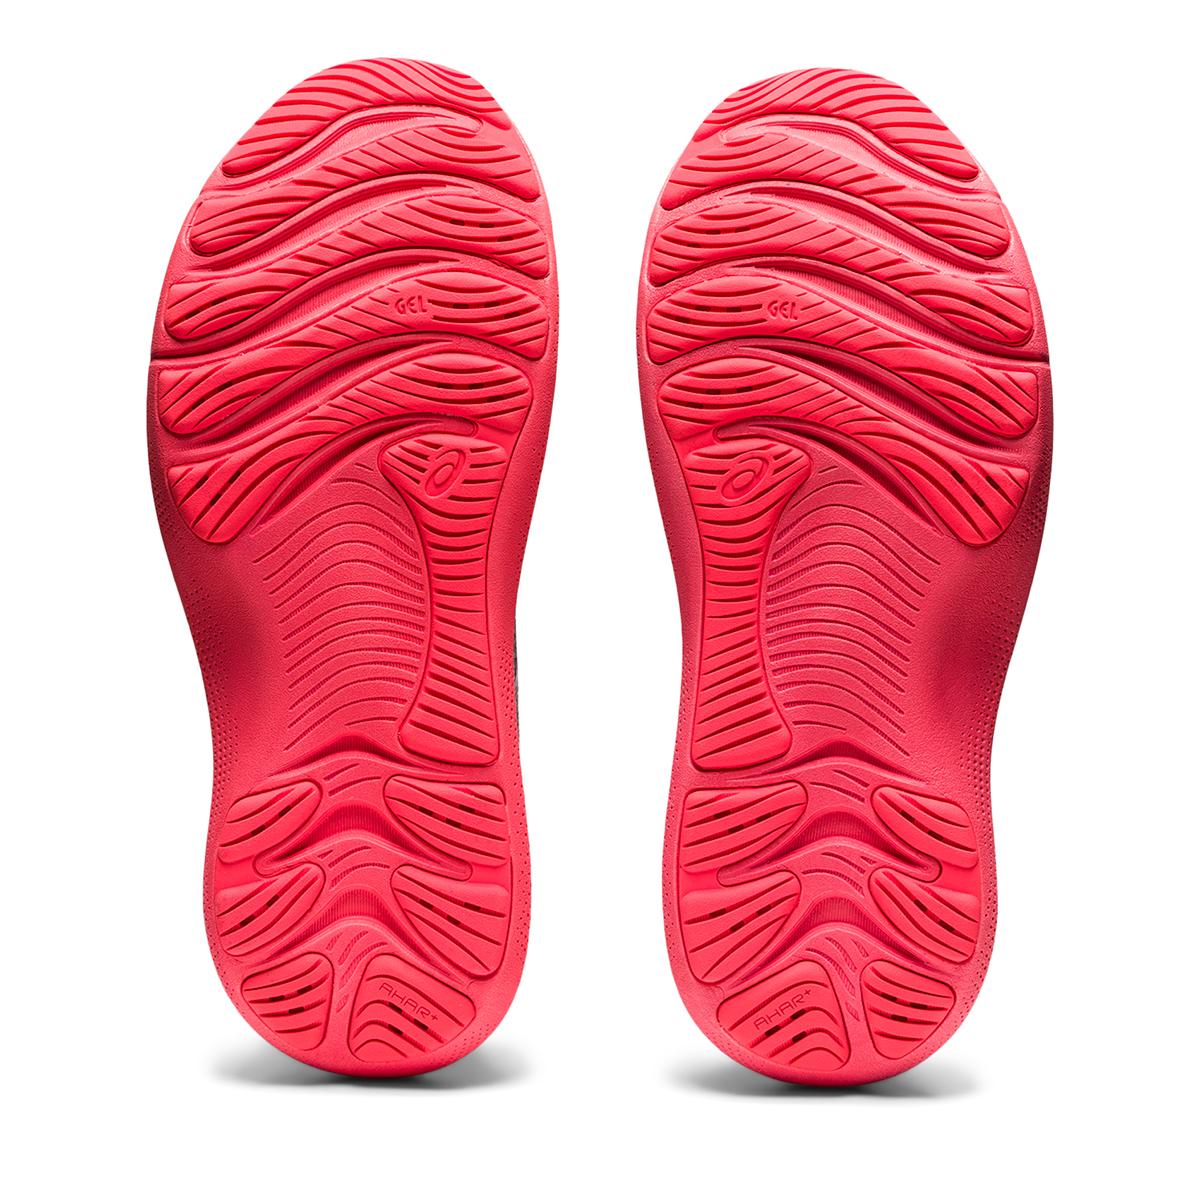 Women's Asics Gel-Nimbus Lite 2 Running Shoe - Color: Blazing Coral  - Size: 5 - Width: Regular, Blazing Coral, large, image 6